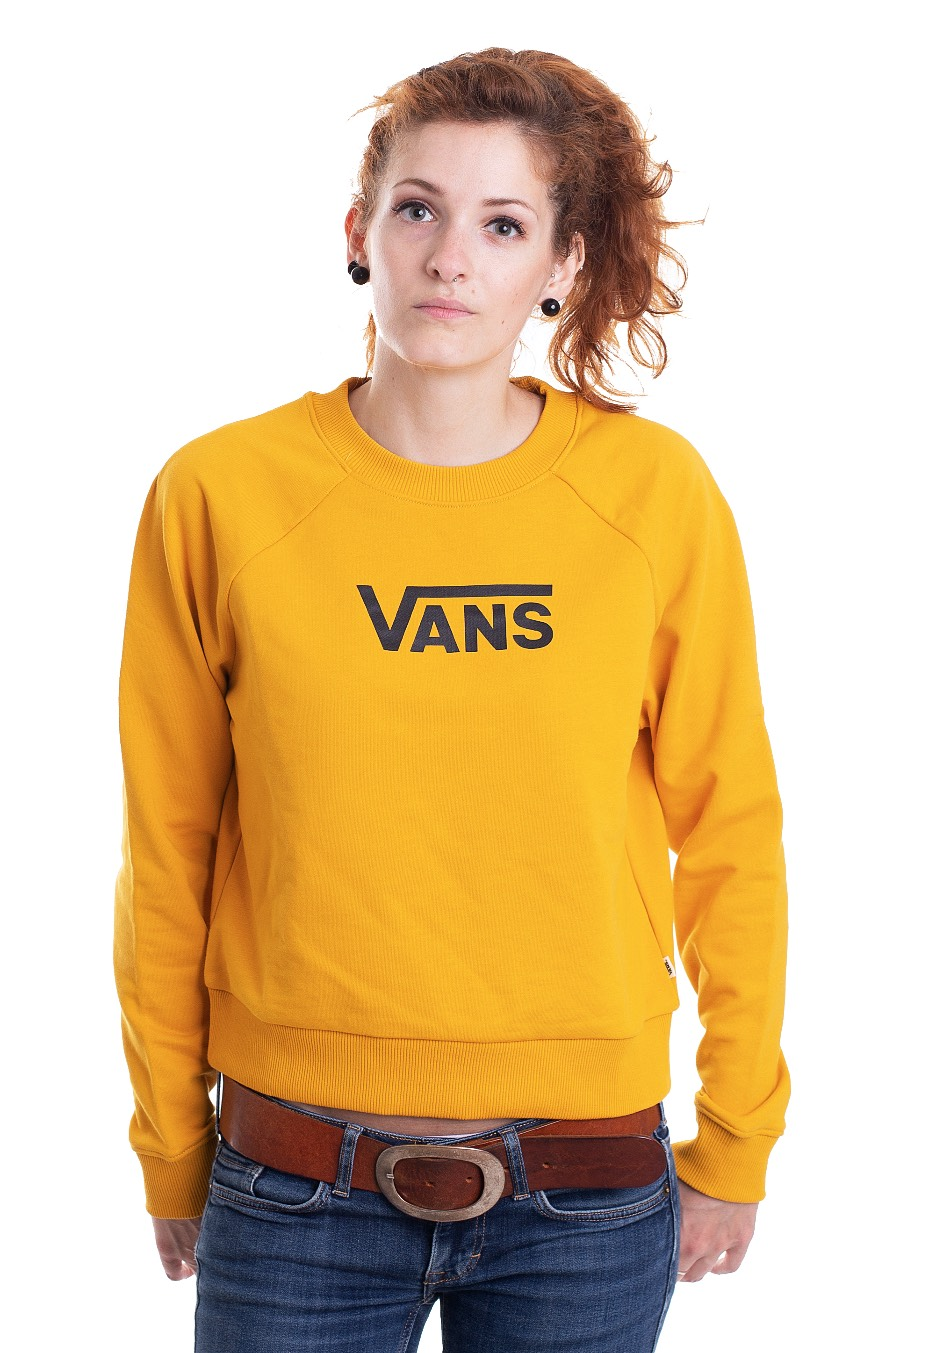 Vans Flying V Ft Boxy Crew Mango Mojito Sweater